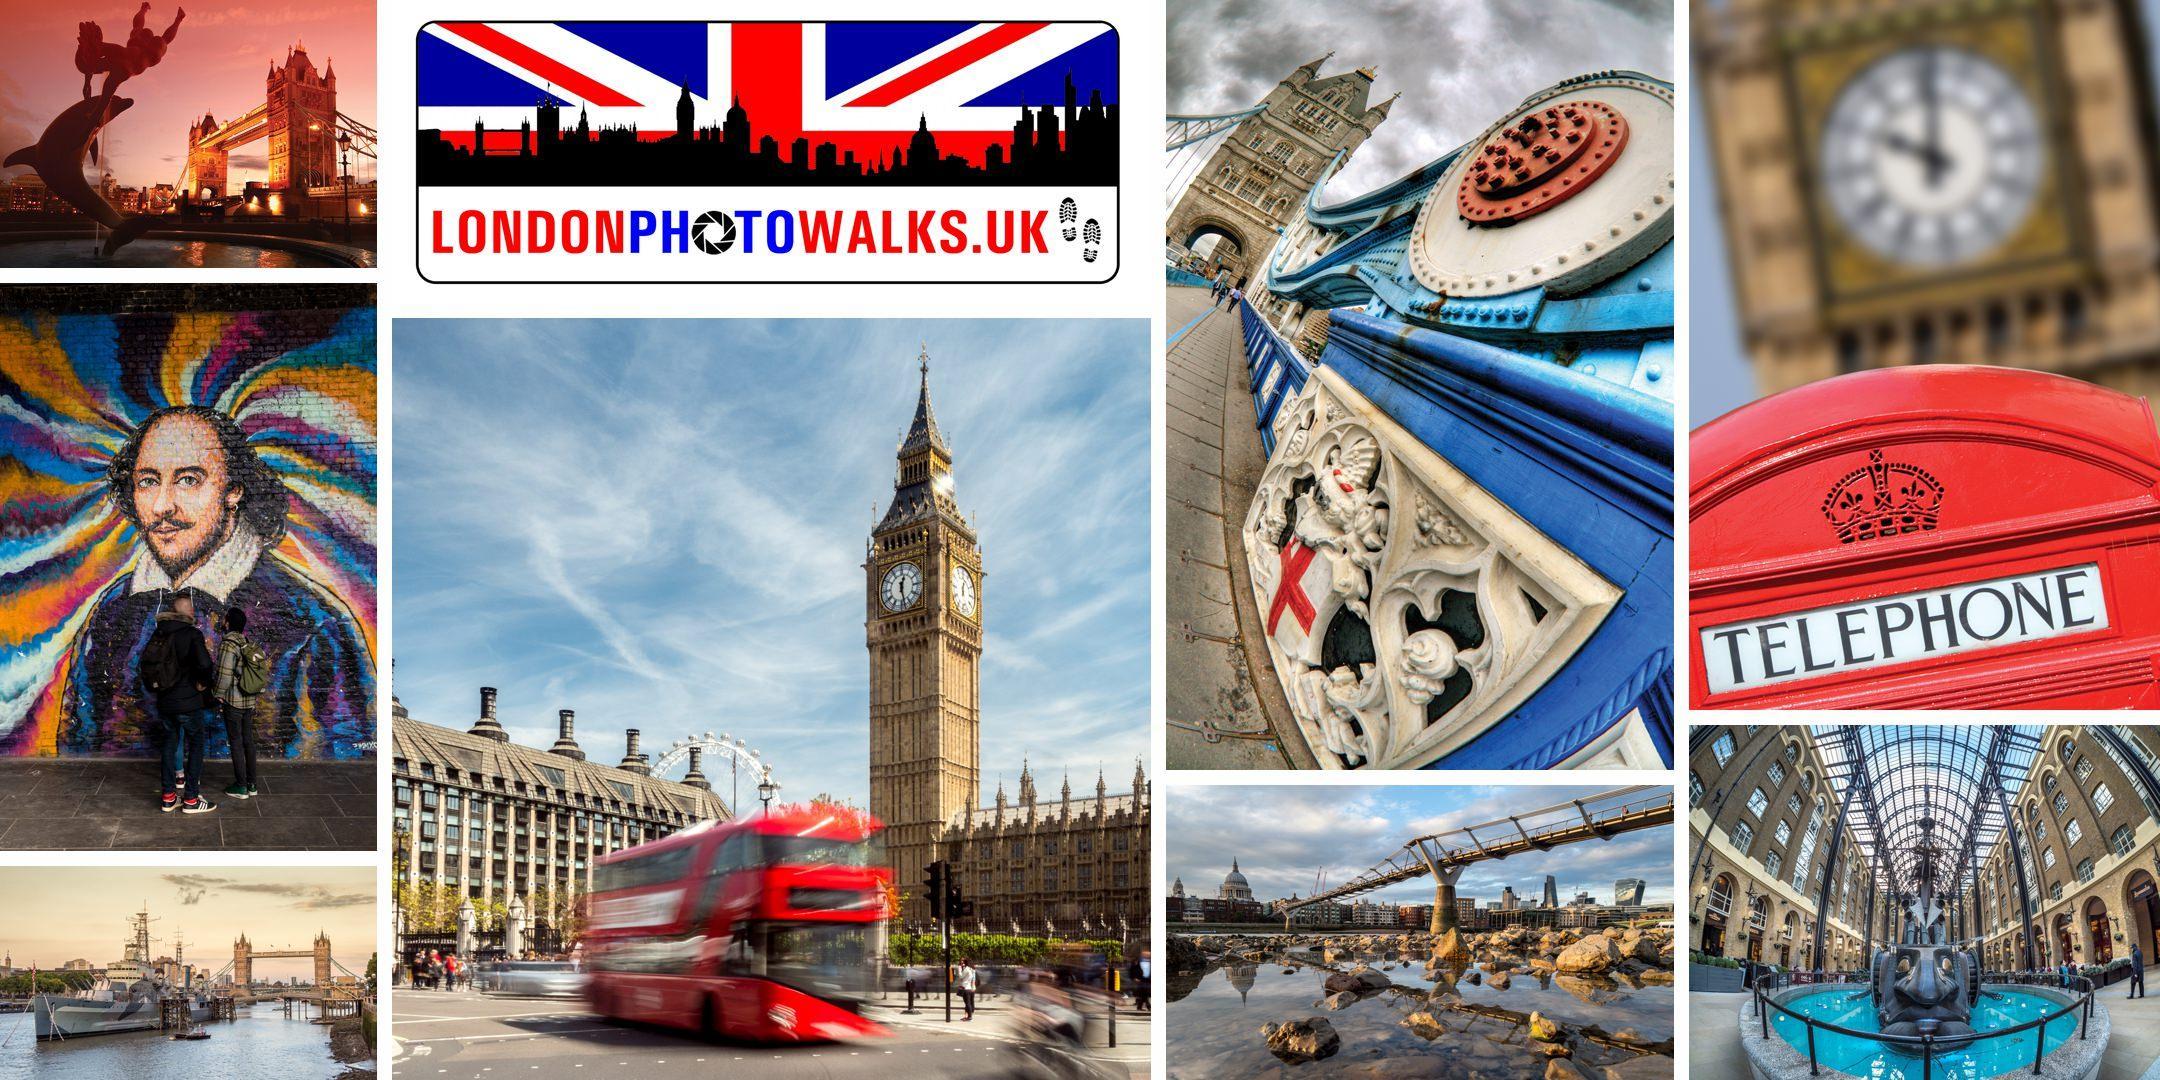 The London South Bank Photo Walk